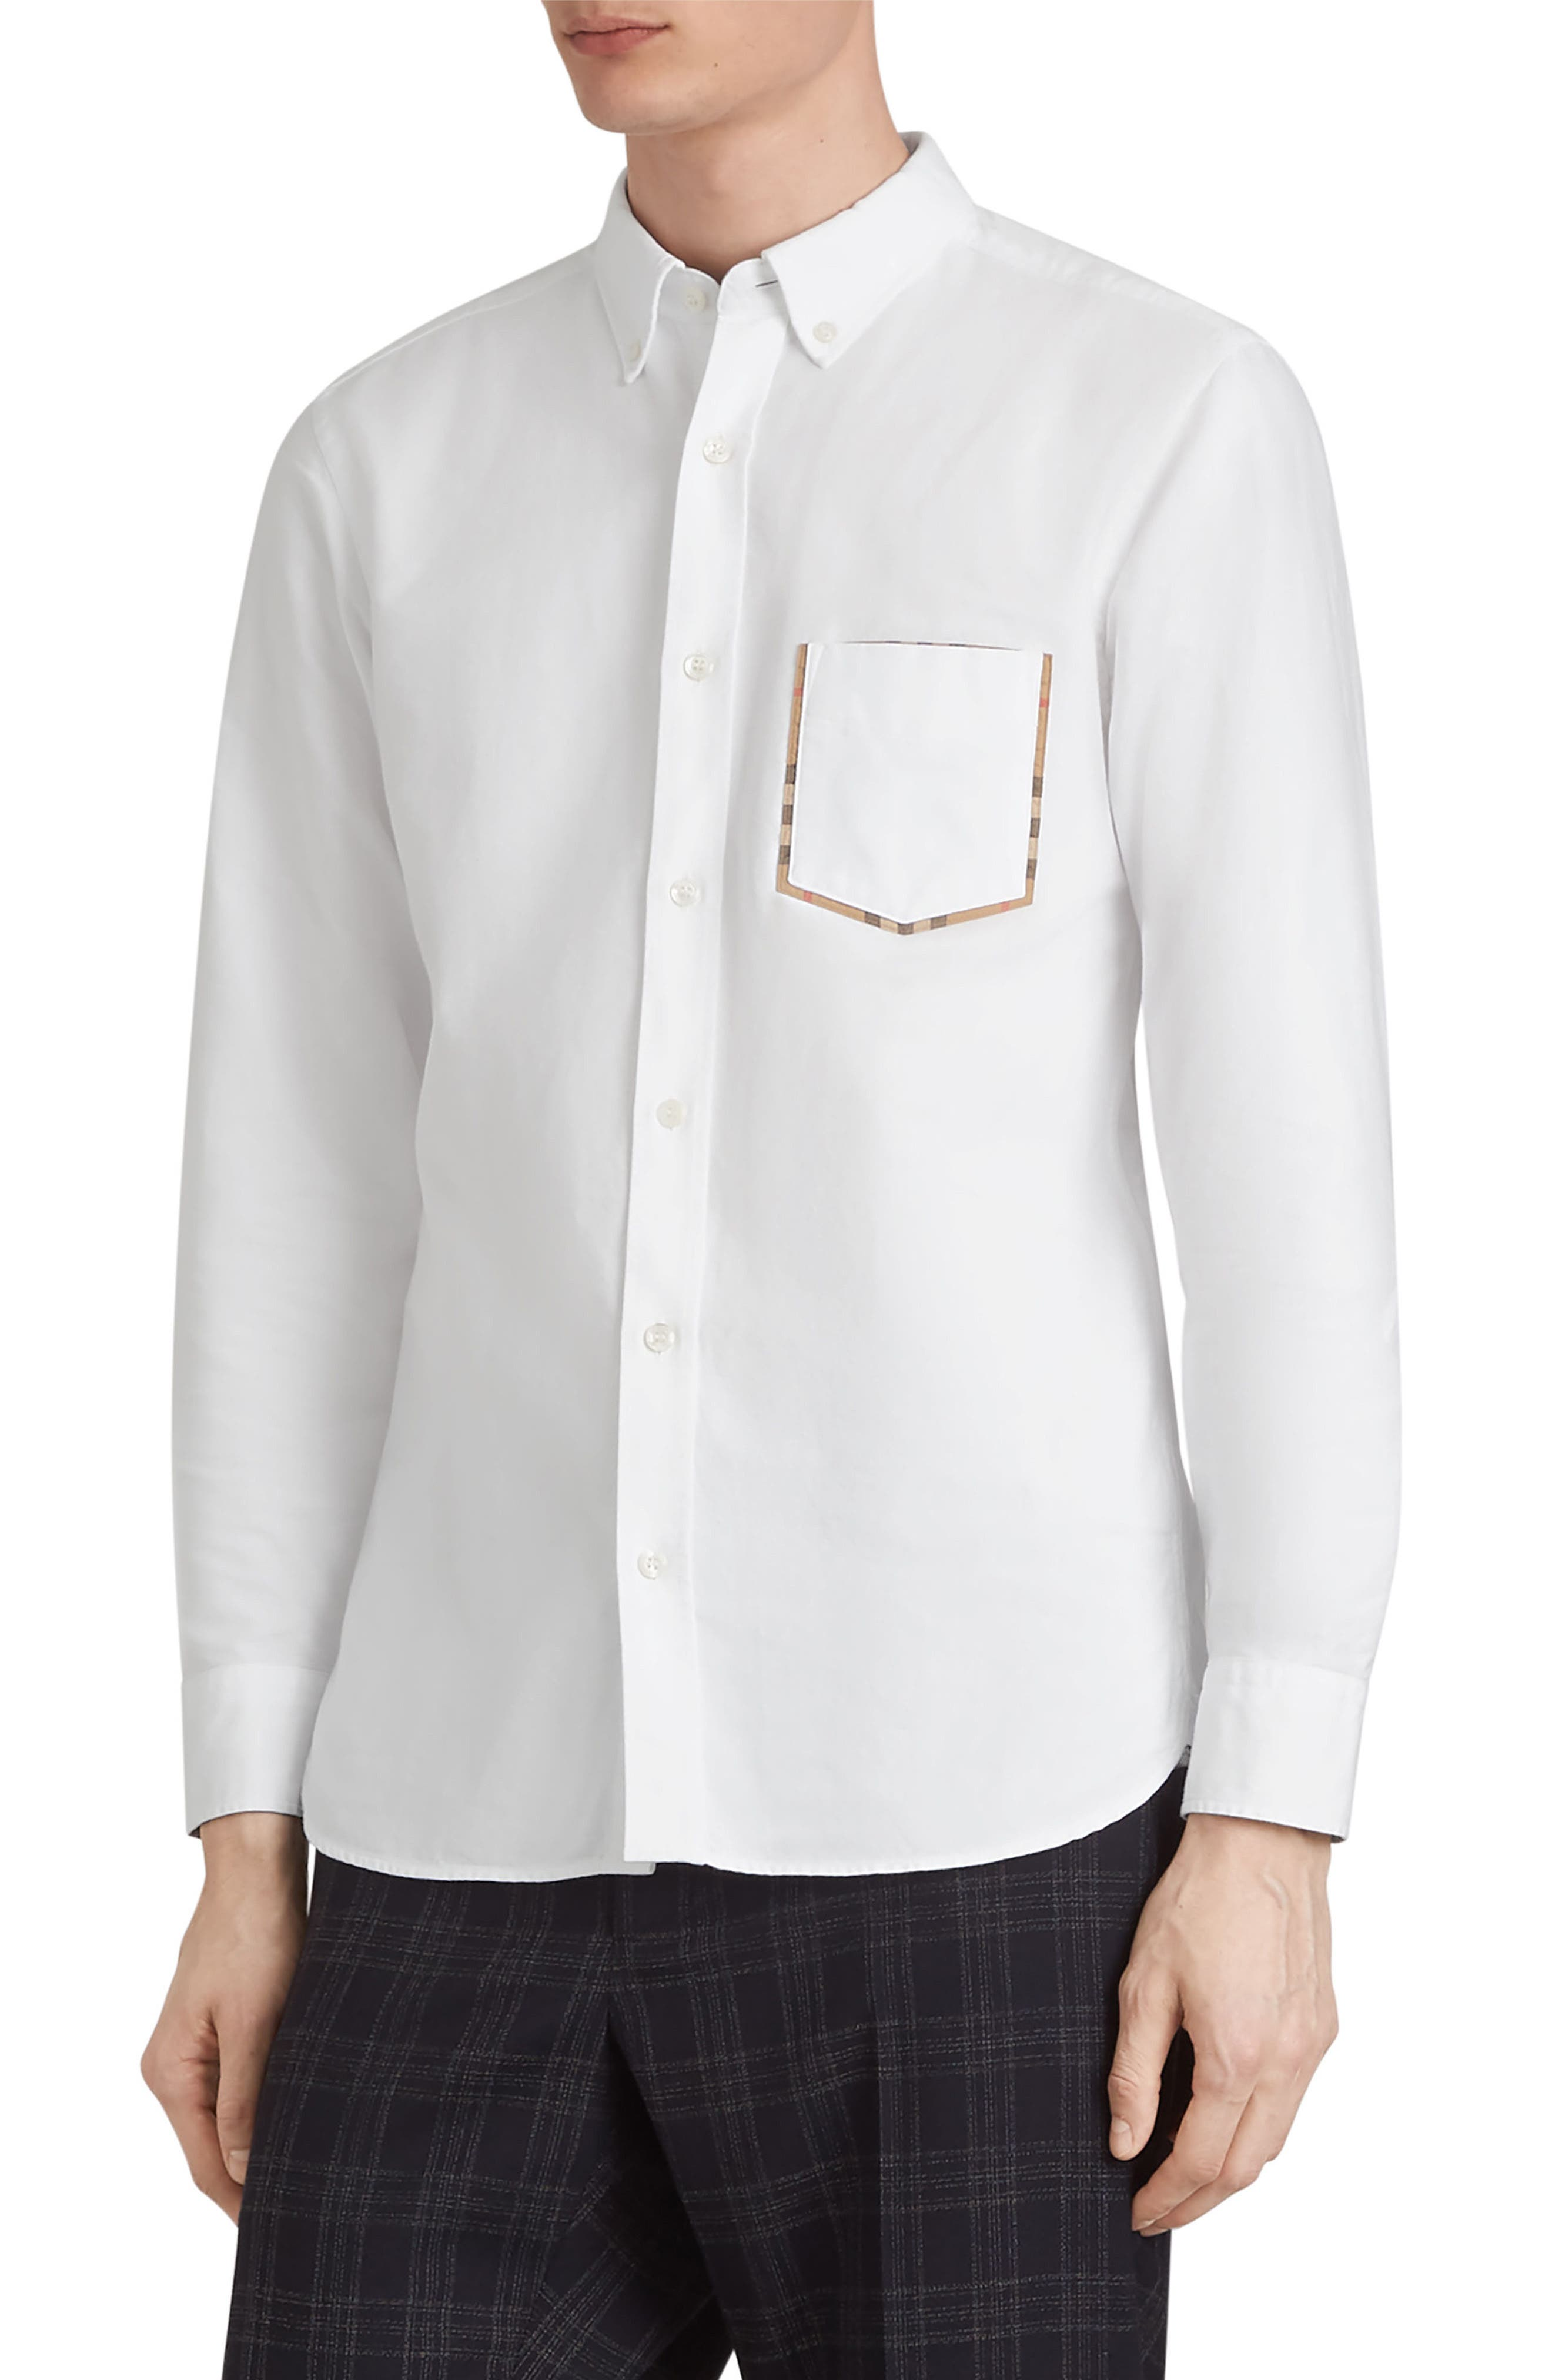 BURBERRY,                             Harry Check Trim Sport Shirt,                             Main thumbnail 1, color,                             WHITE